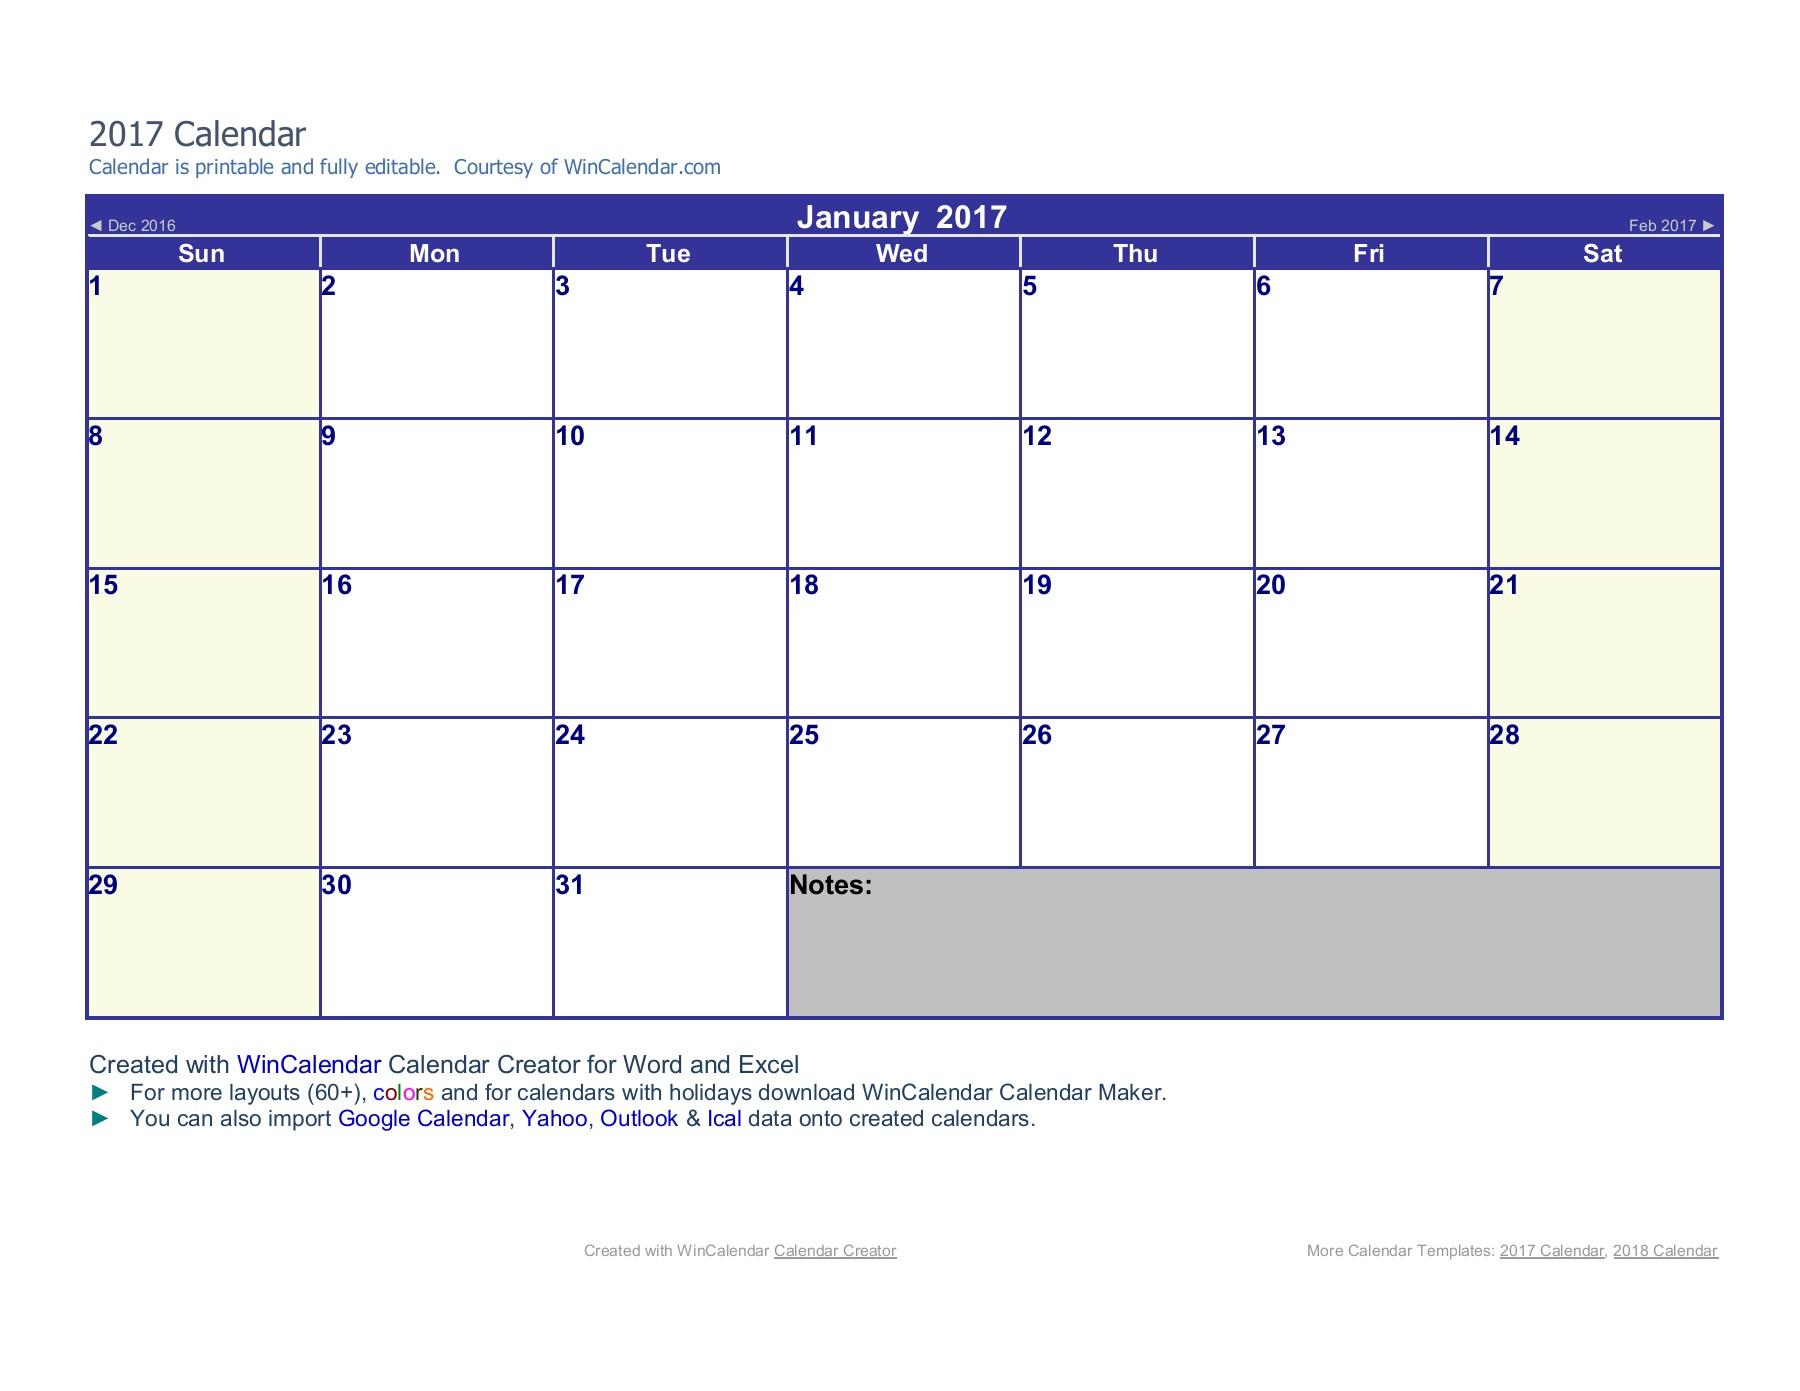 2017 Word Calendar with Word Calendar Creator